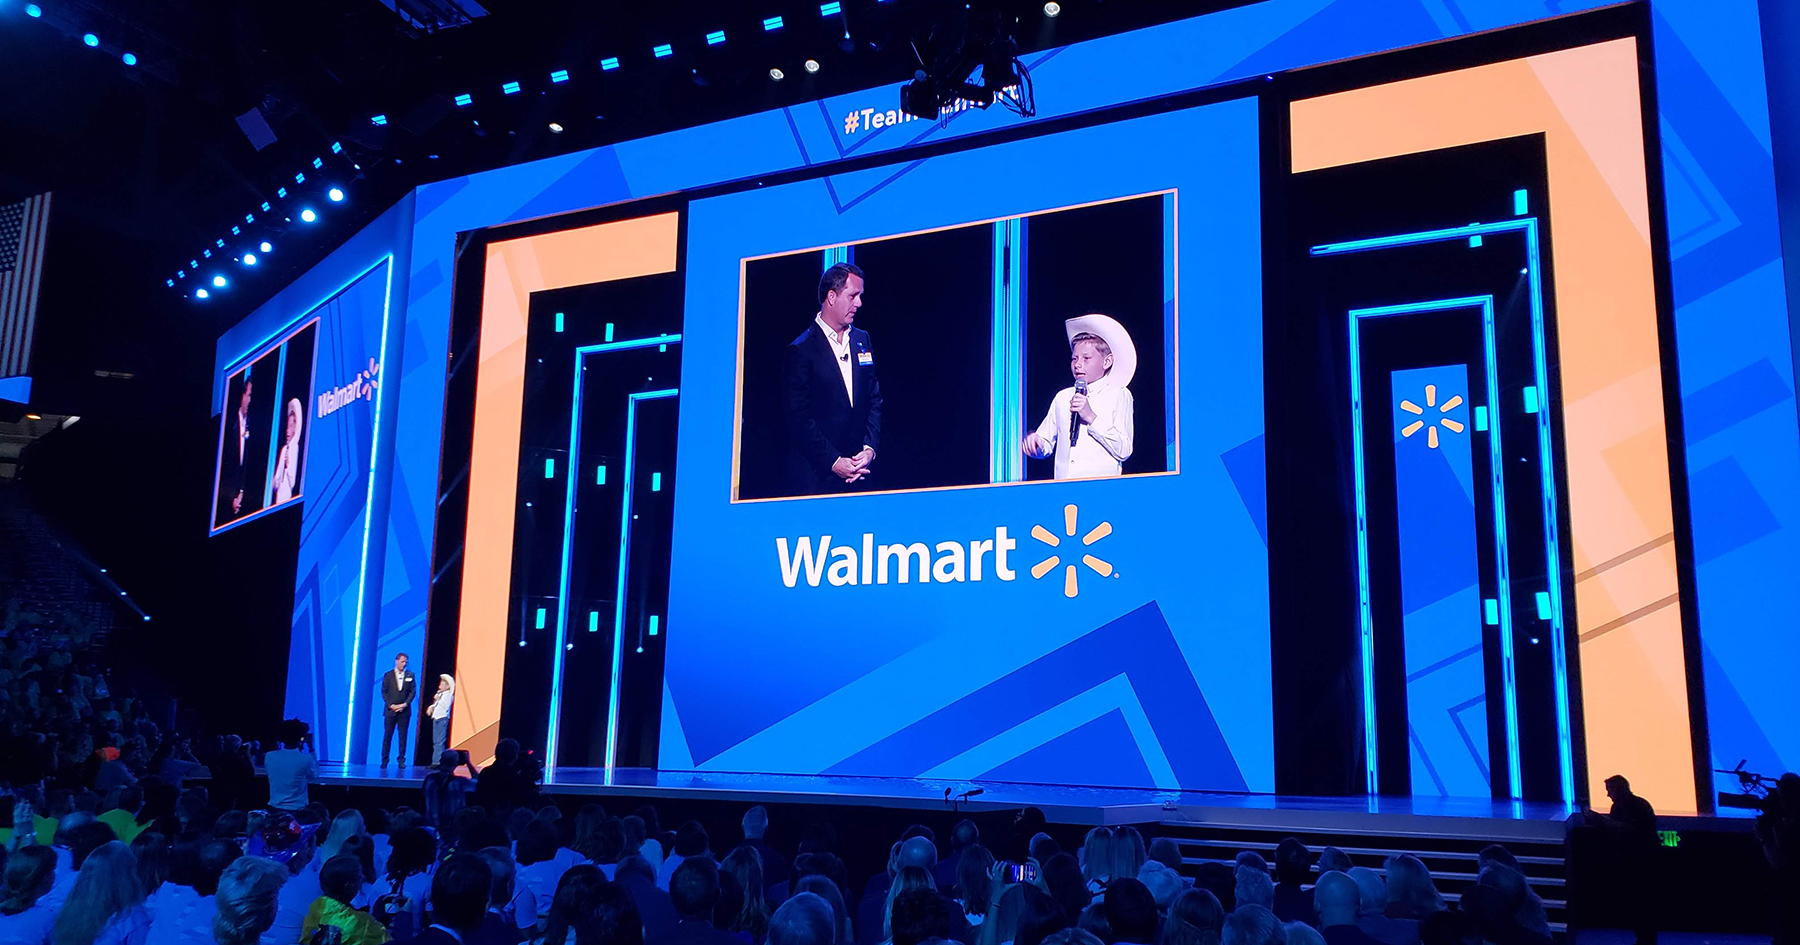 Walmart Details Renovation Plans in Key States